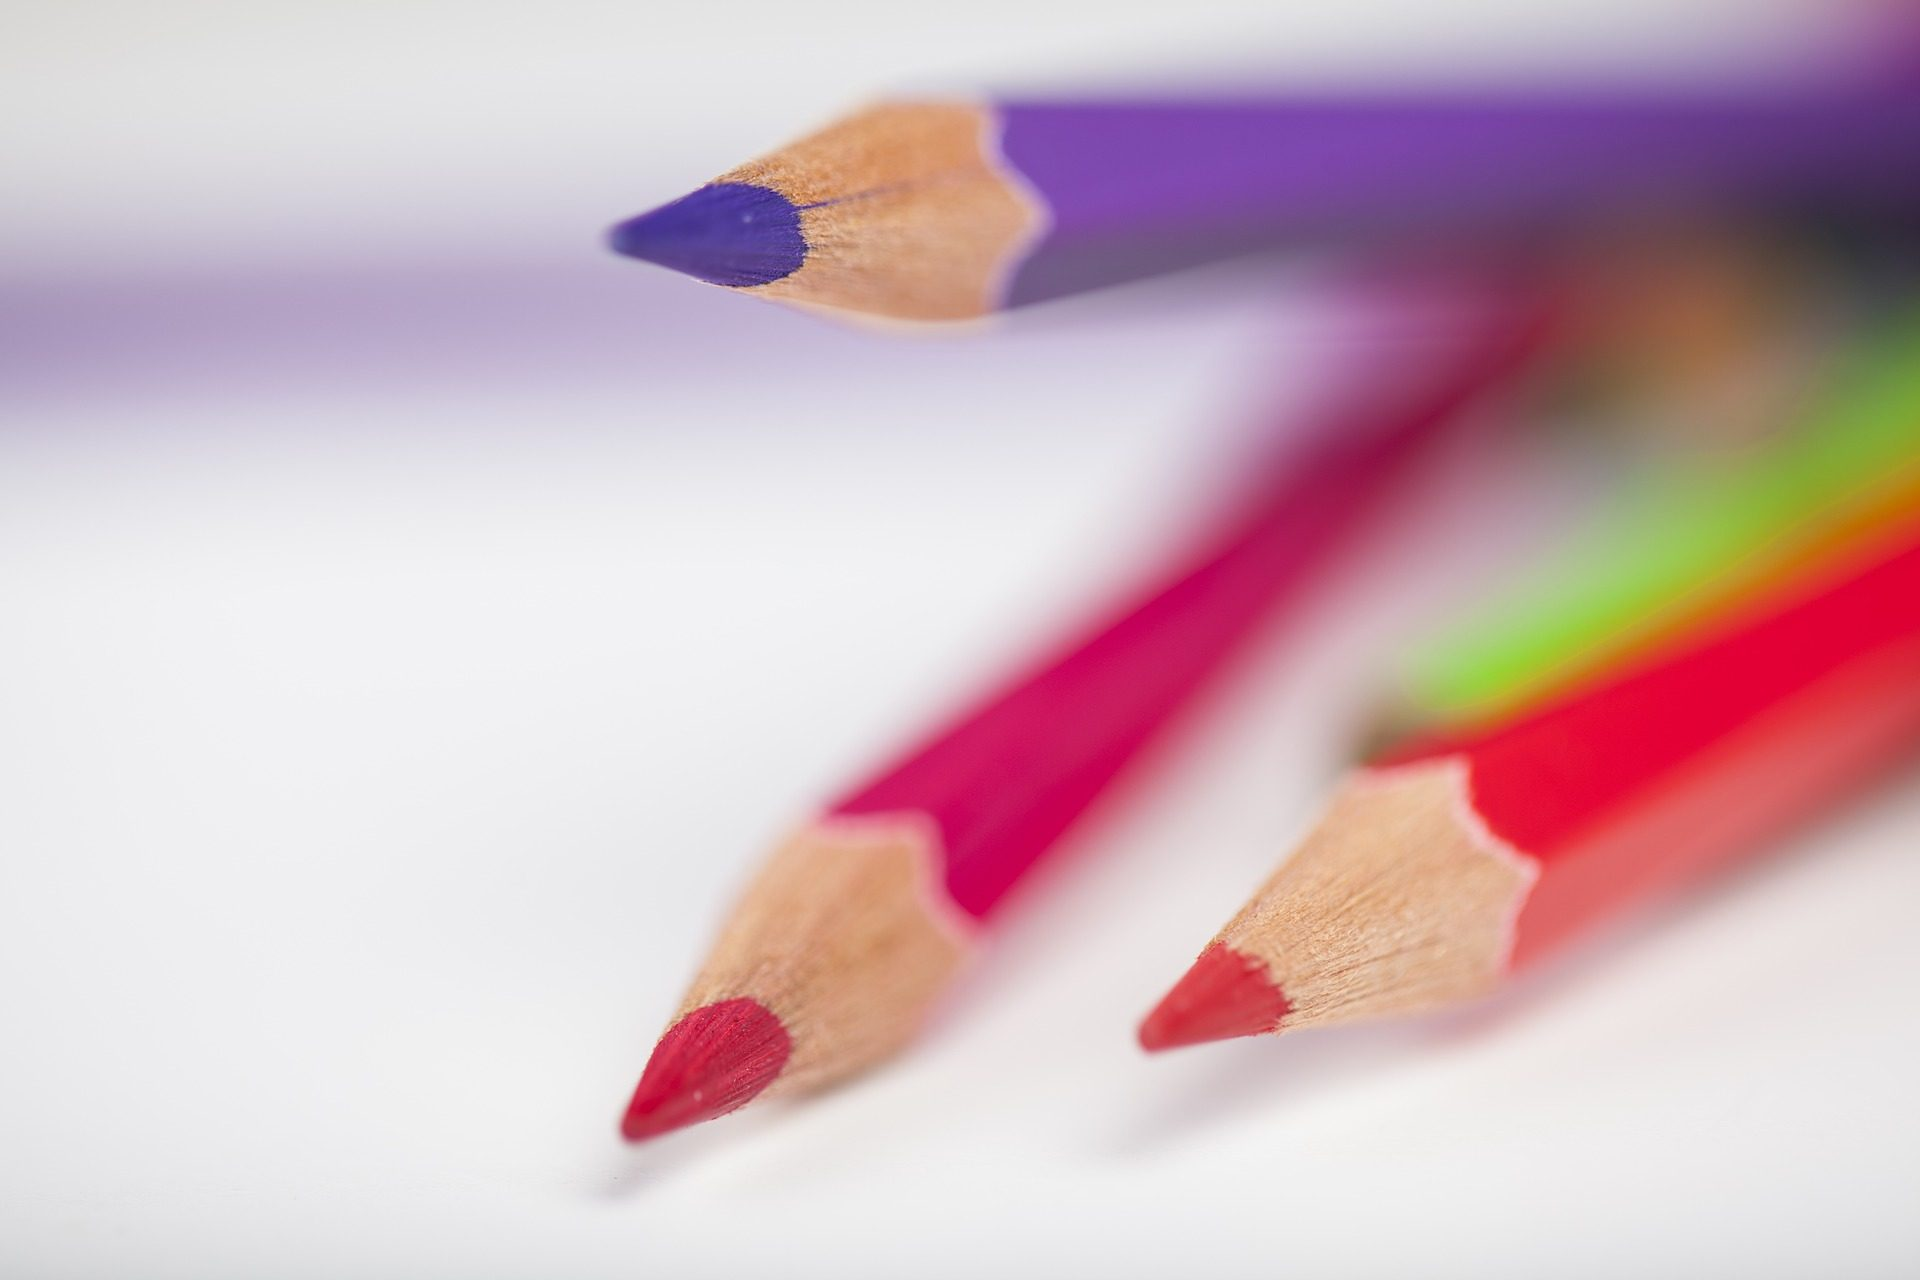 lápices, colores, puntas, madera, de cerca - Fondos de Pantalla HD - professor-falken.com